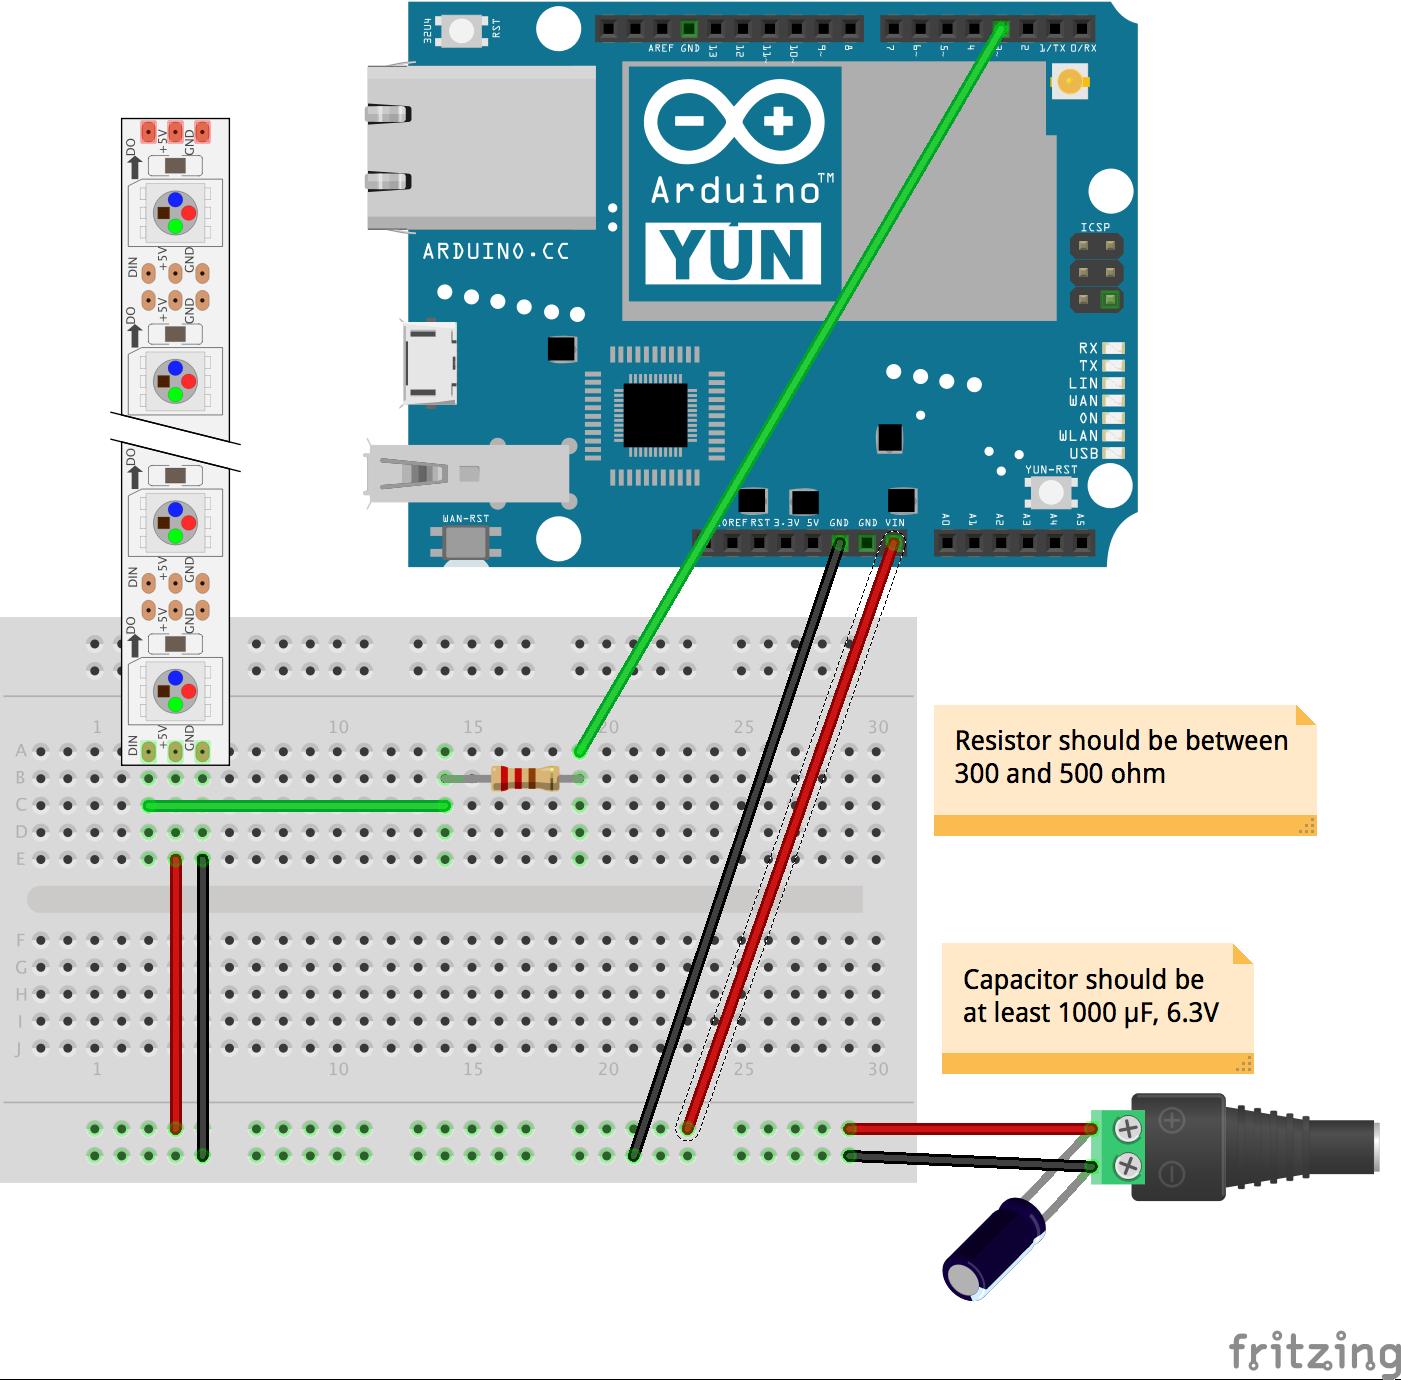 Arduino Yun Pin Diagram Motor Compatible Shield In The Arduinoduepinoutdiagram Github Lumiere Lighting Node